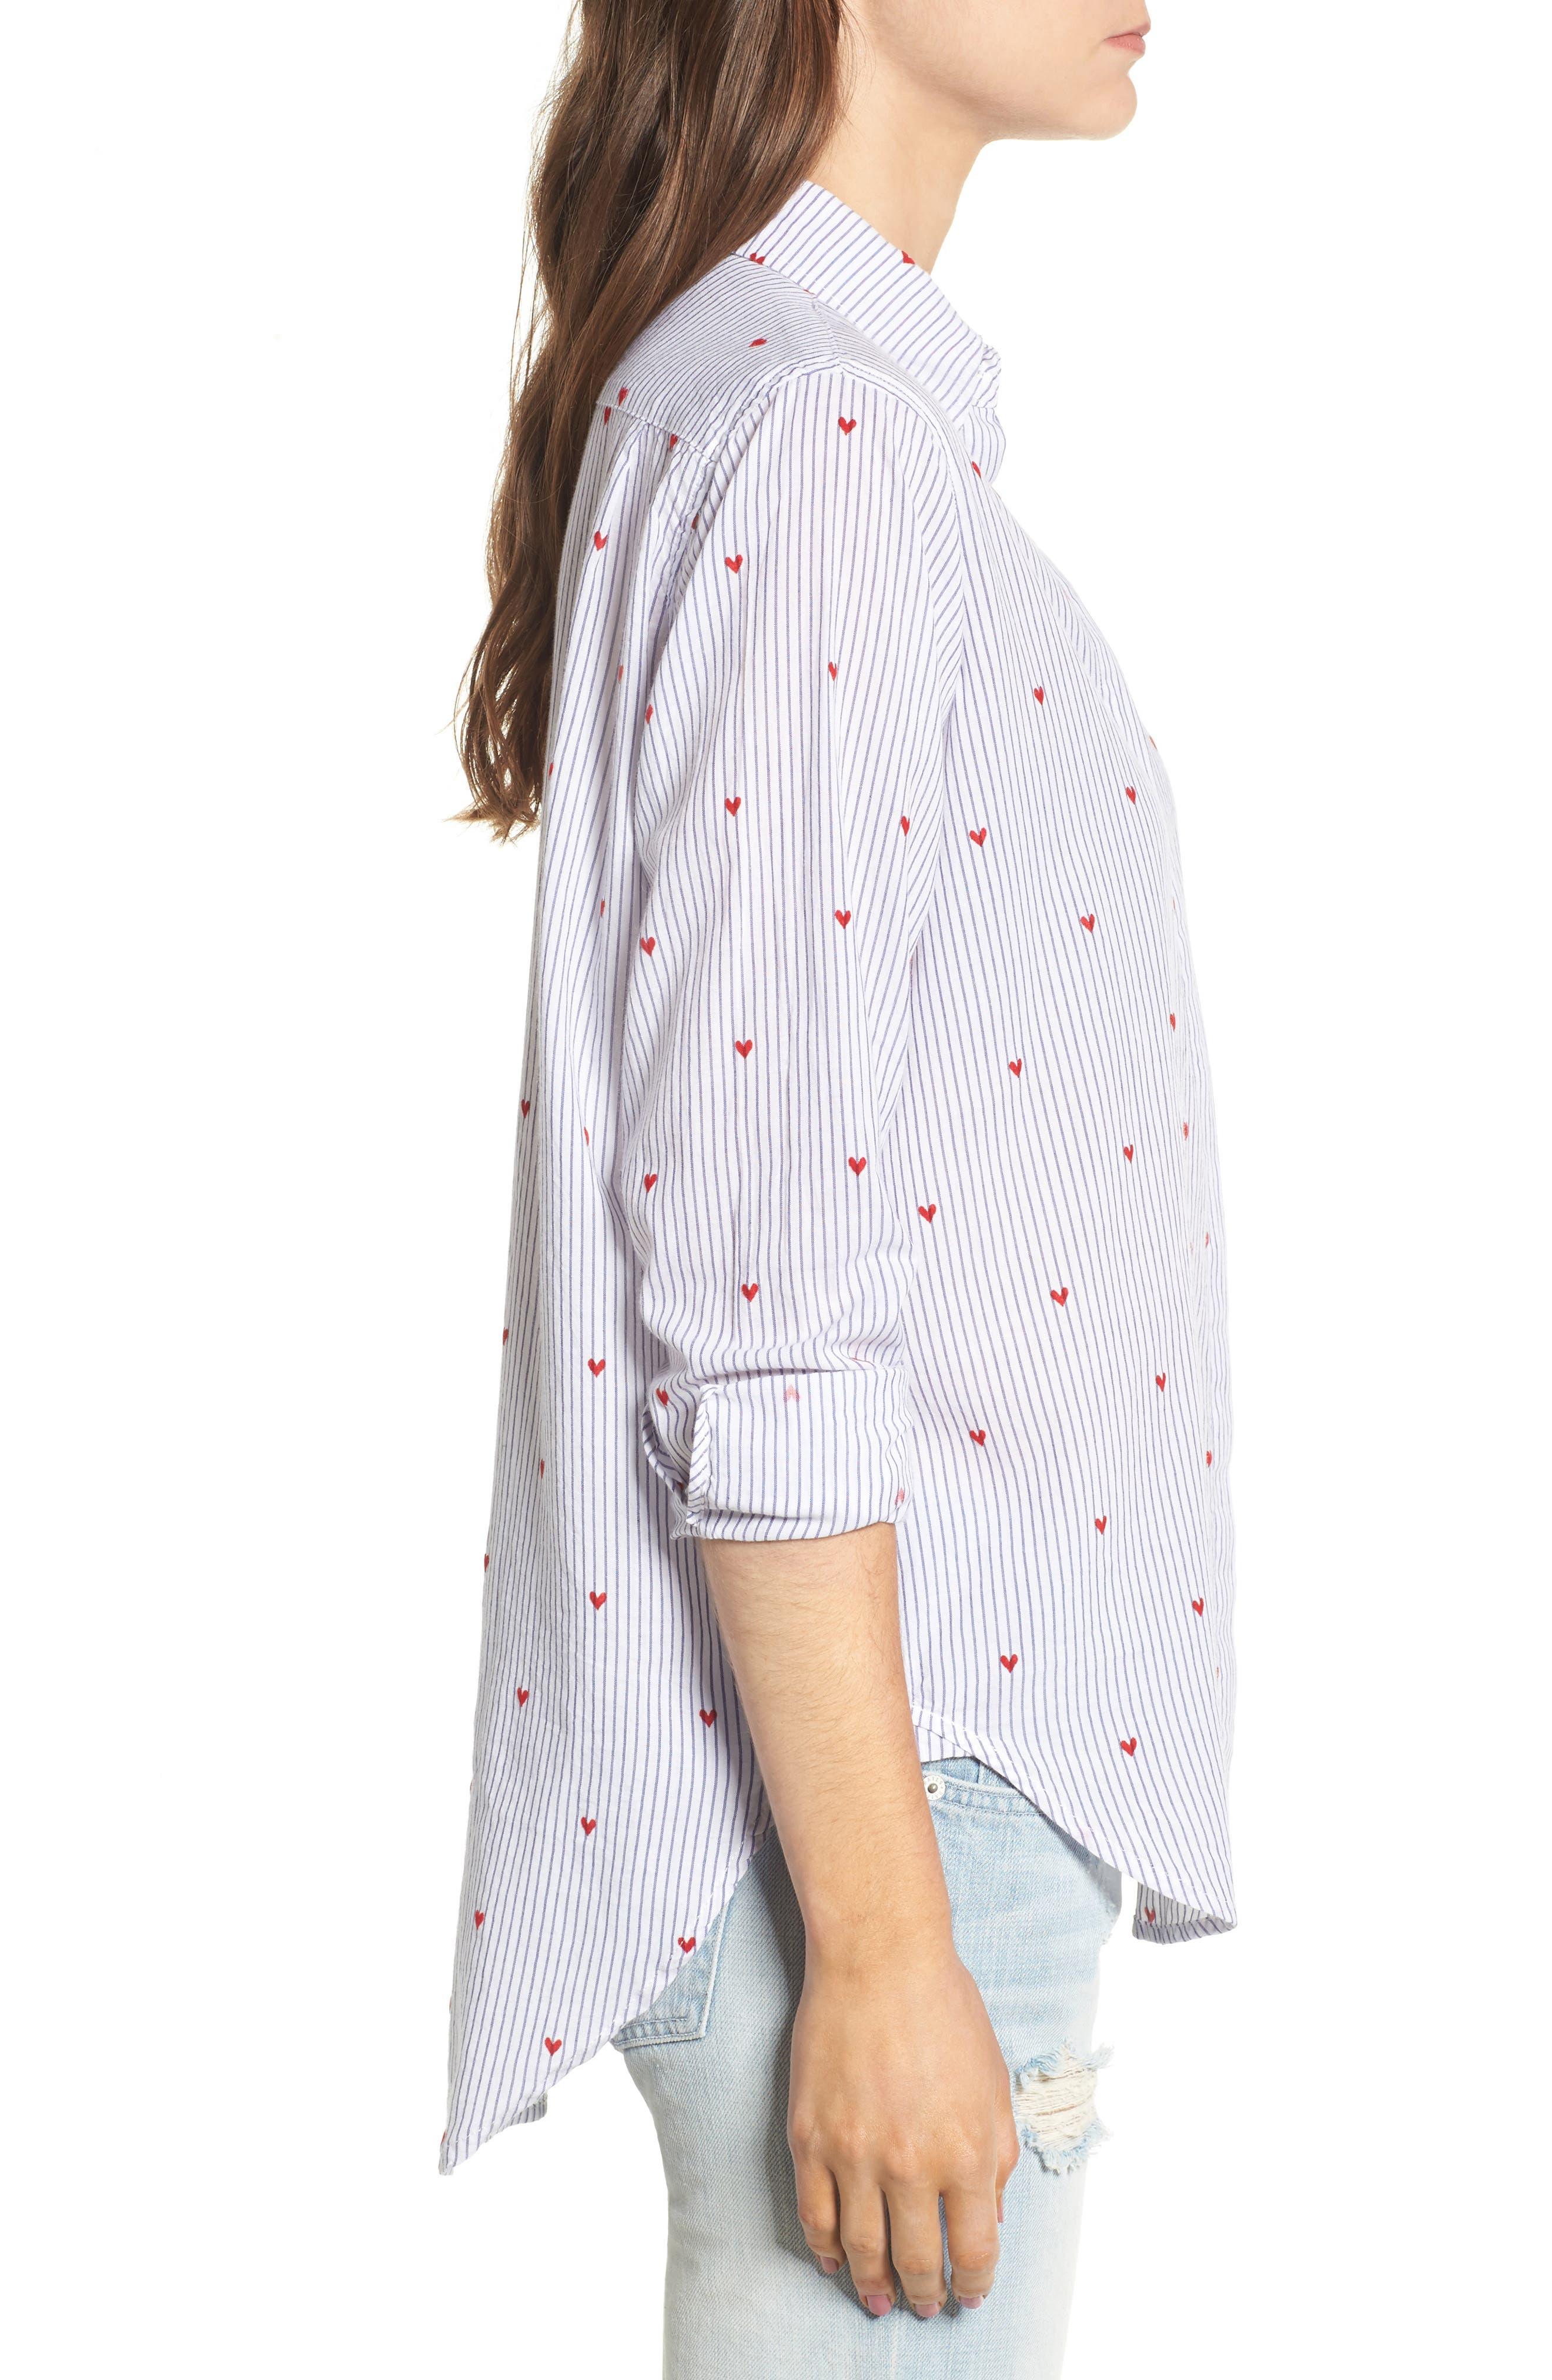 Taylor Heart Stripe Shirt,                             Alternate thumbnail 3, color,                             400